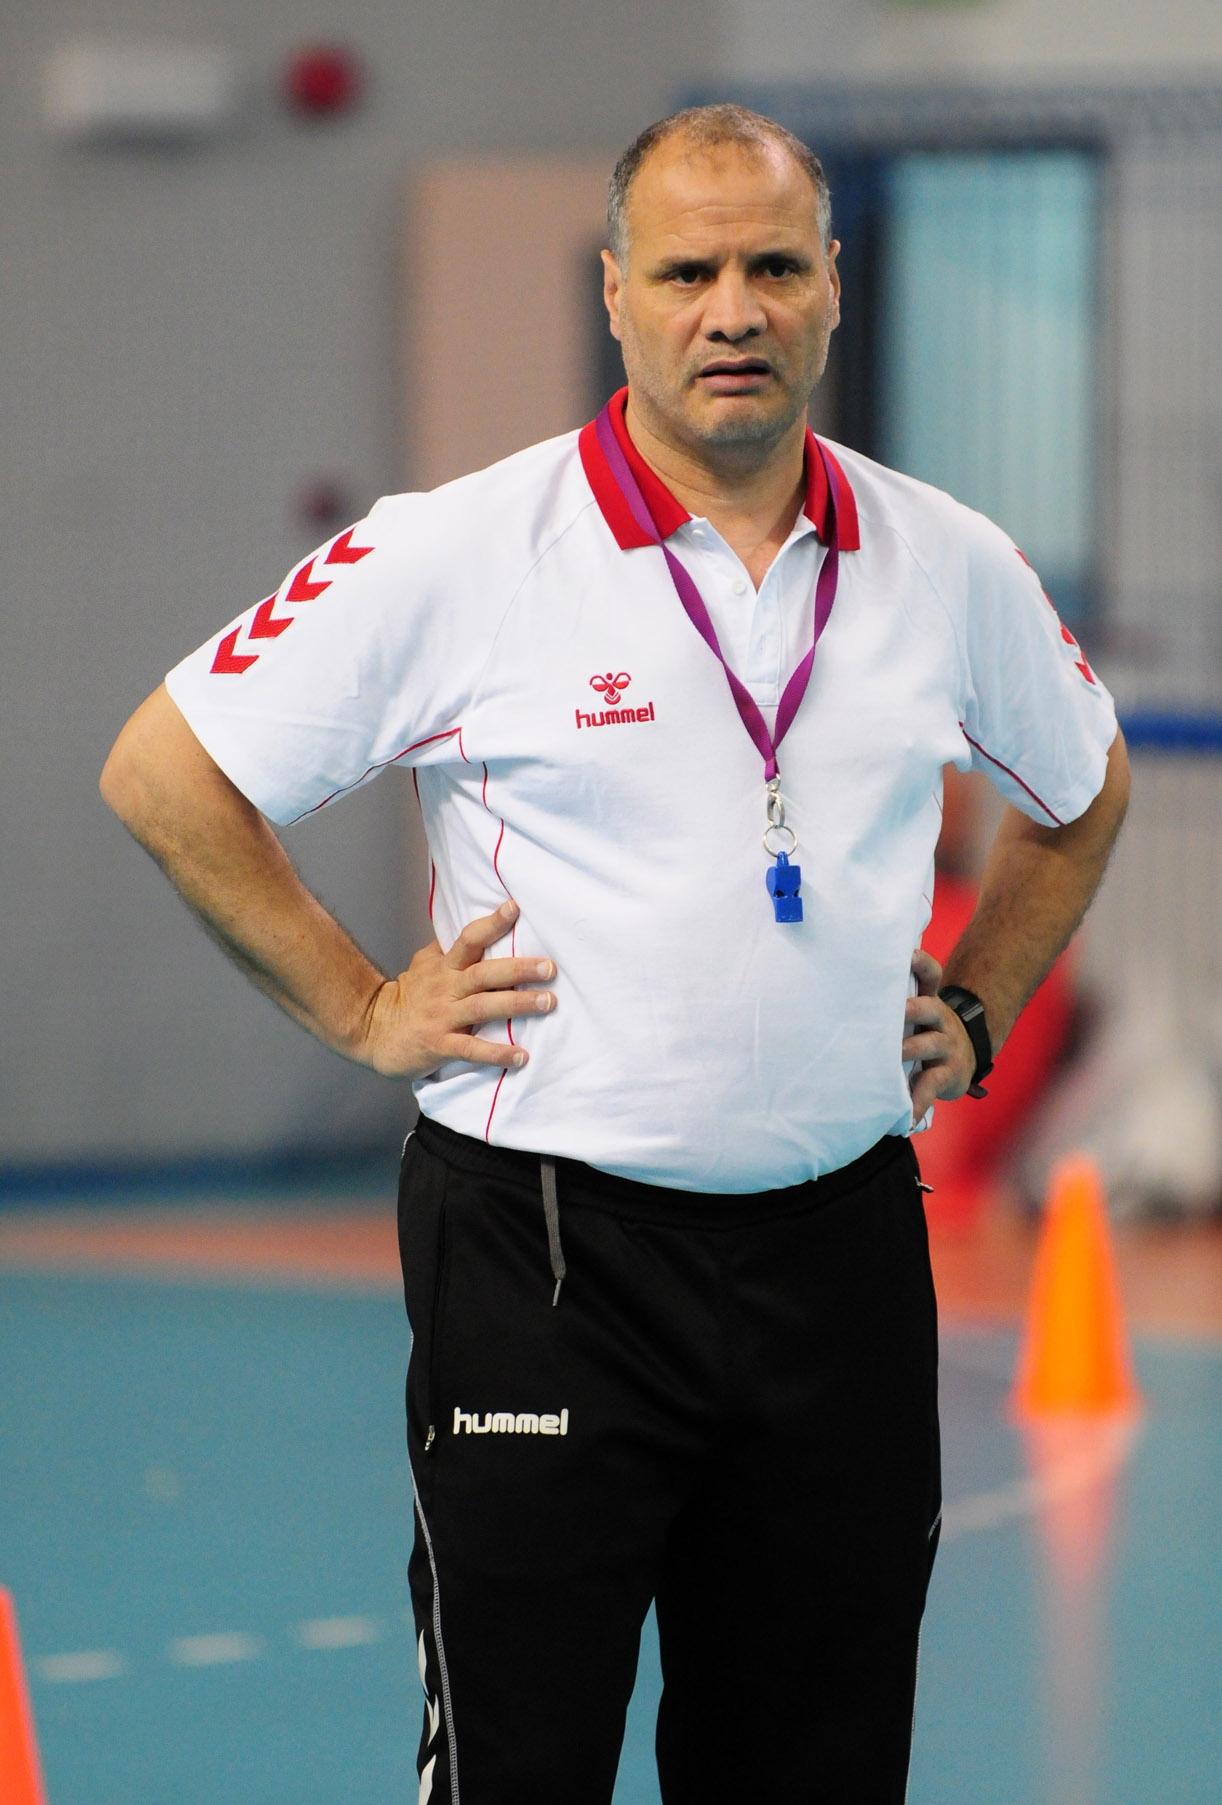 صالح بوشكريو